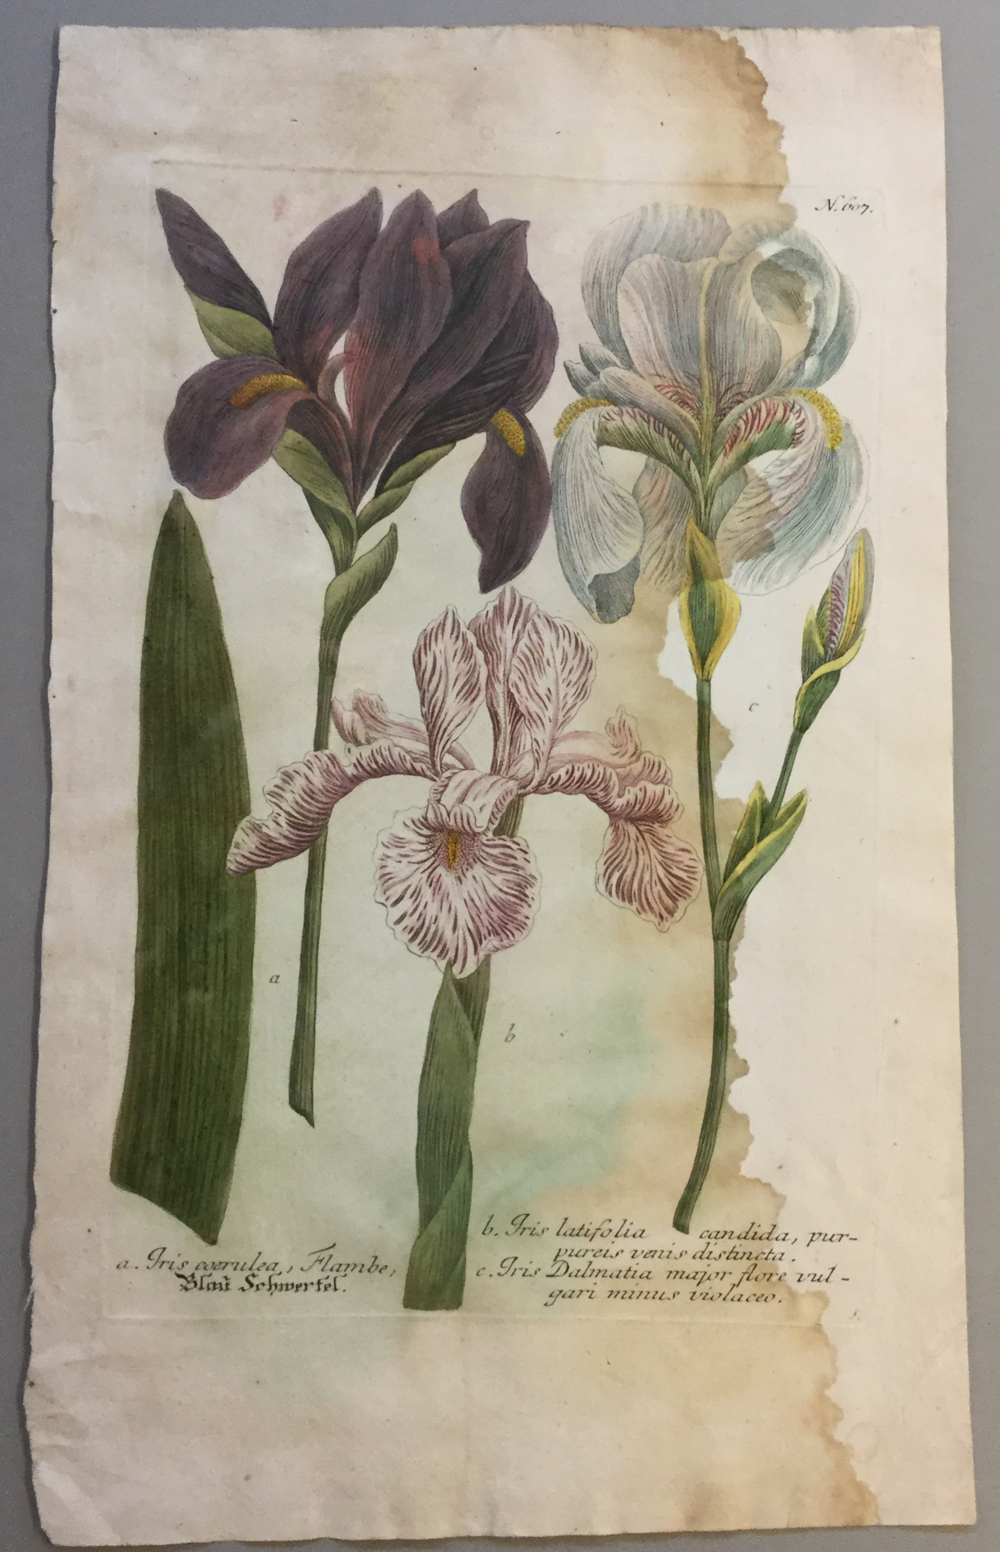 botanical print from Phytanthoza iconographia, vol. 3: Ill. 607 (J. W. Weinmann, 1742).